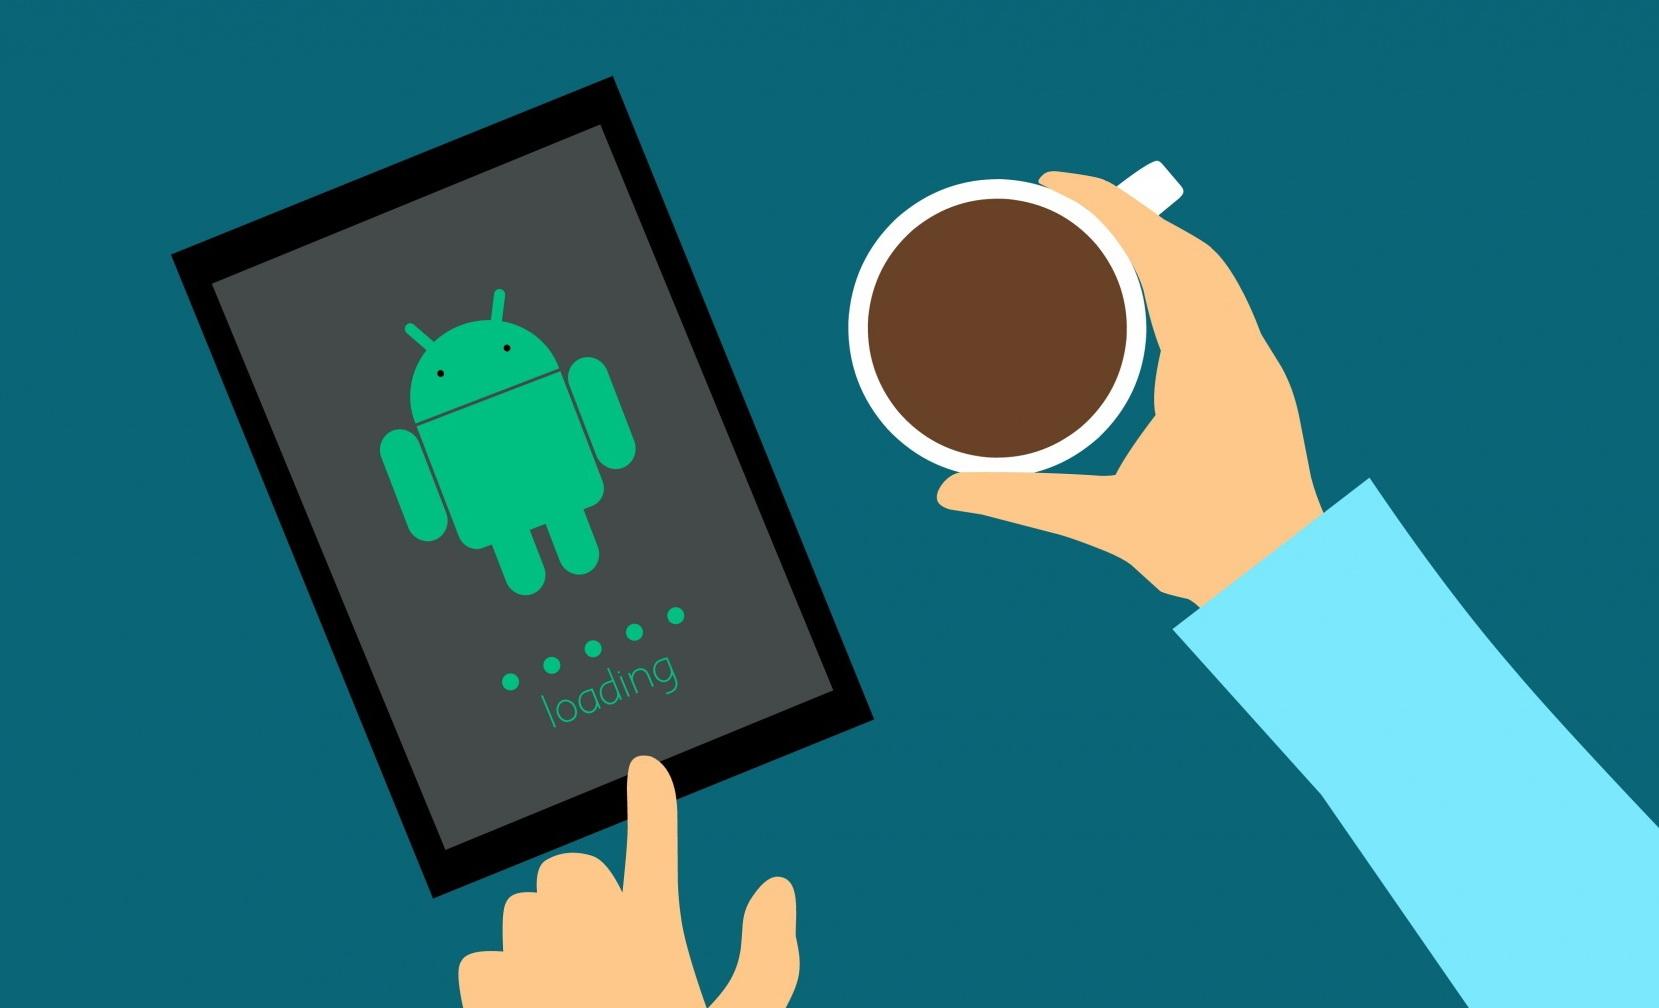 Android 11發布會敲定!諸多新功能加入